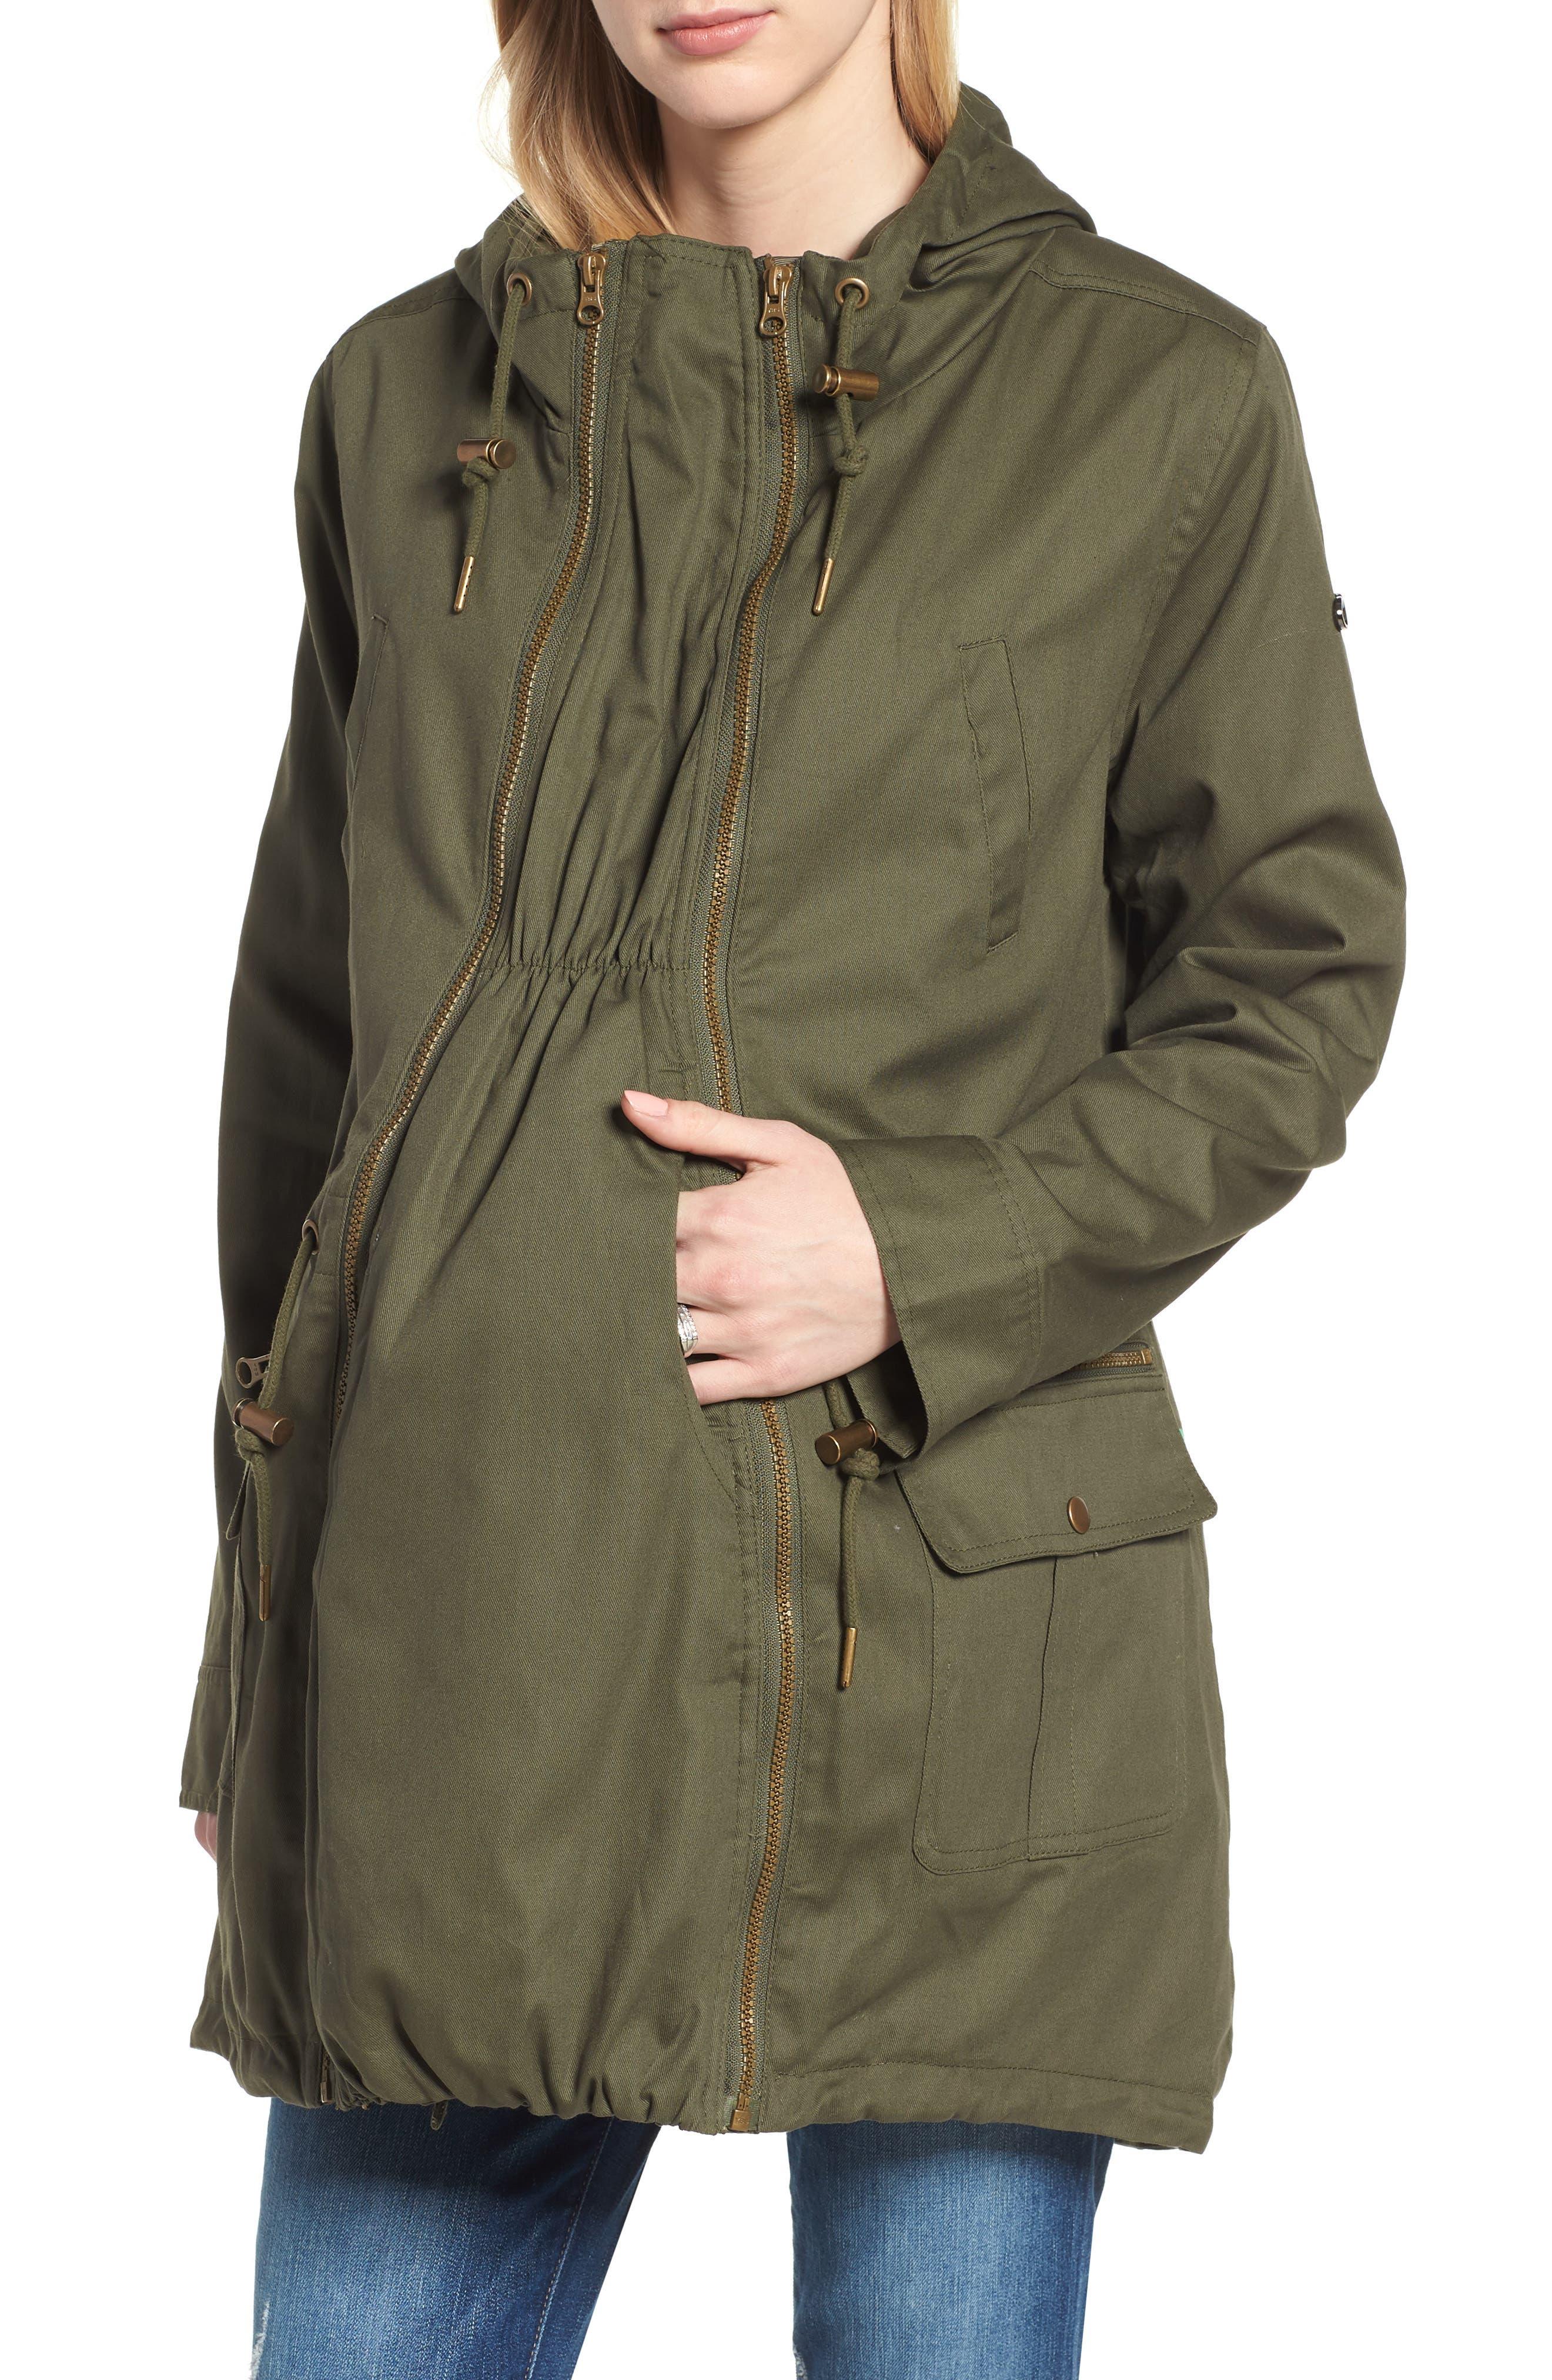 Convertible Military 3-in-1 Maternity/Nursing Jacket,                         Main,                         color, Khaki Green